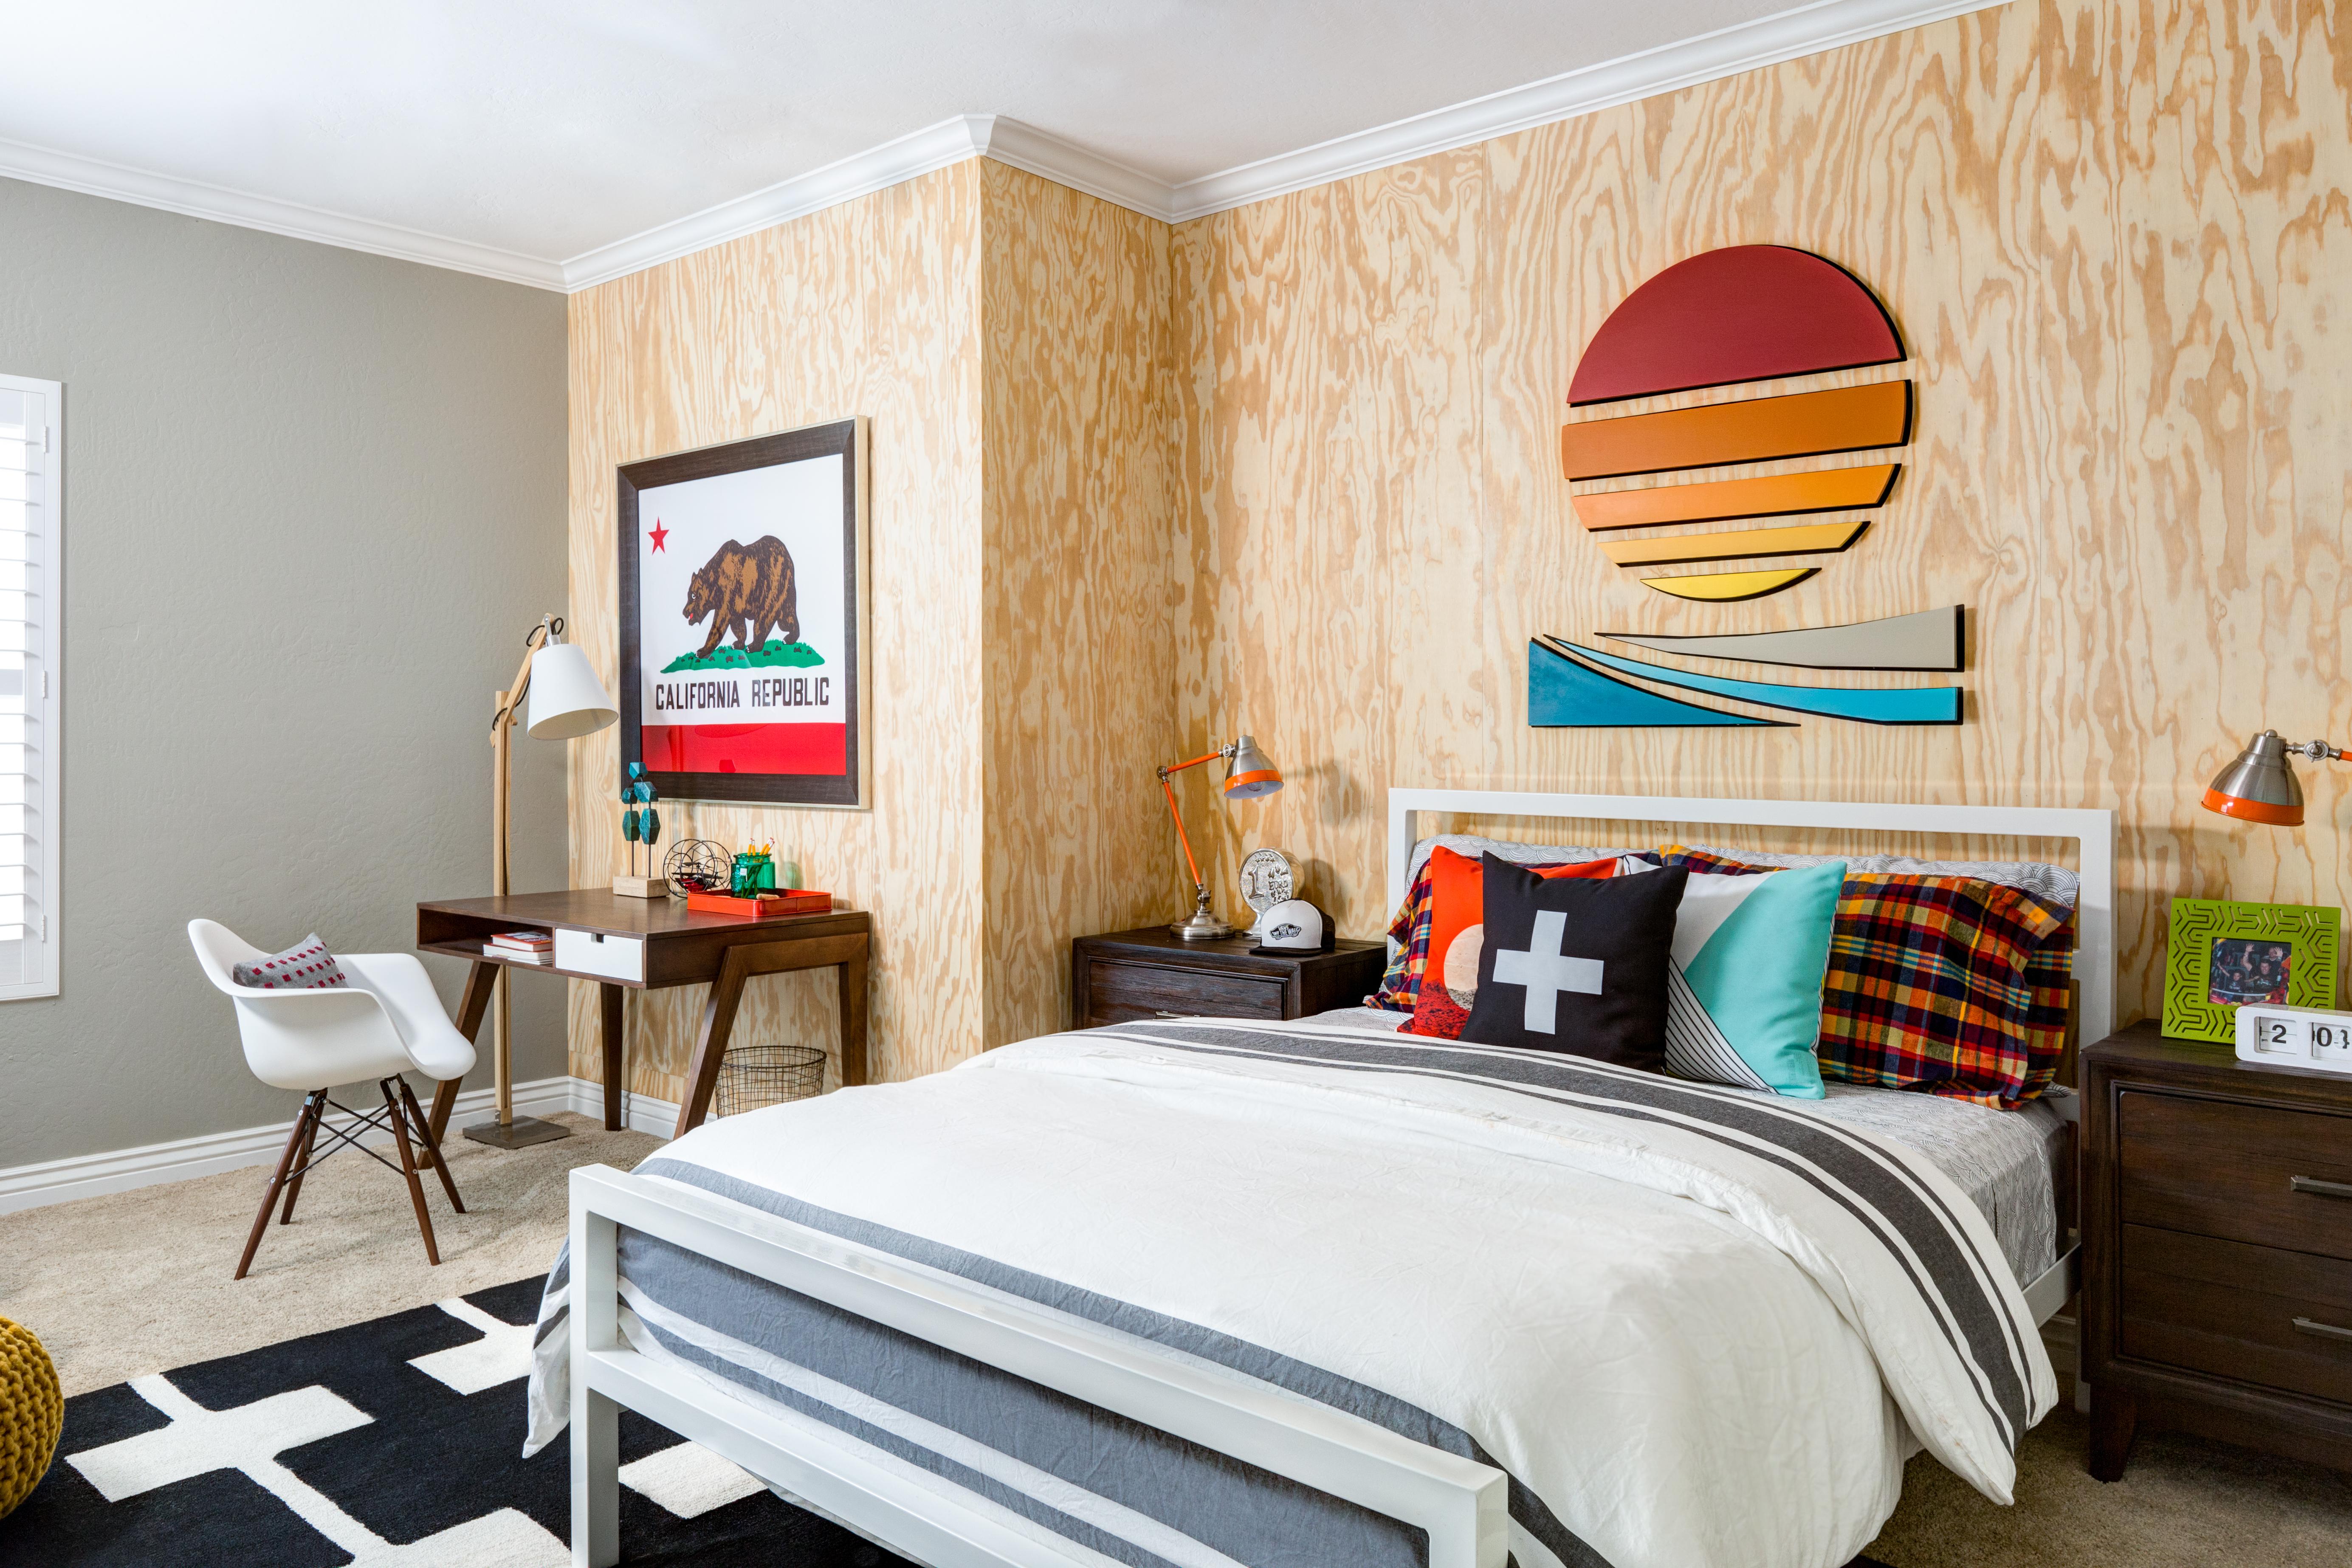 Modern Boys Room 5 Boys' Room Designs To Inspire You  Project Nursery